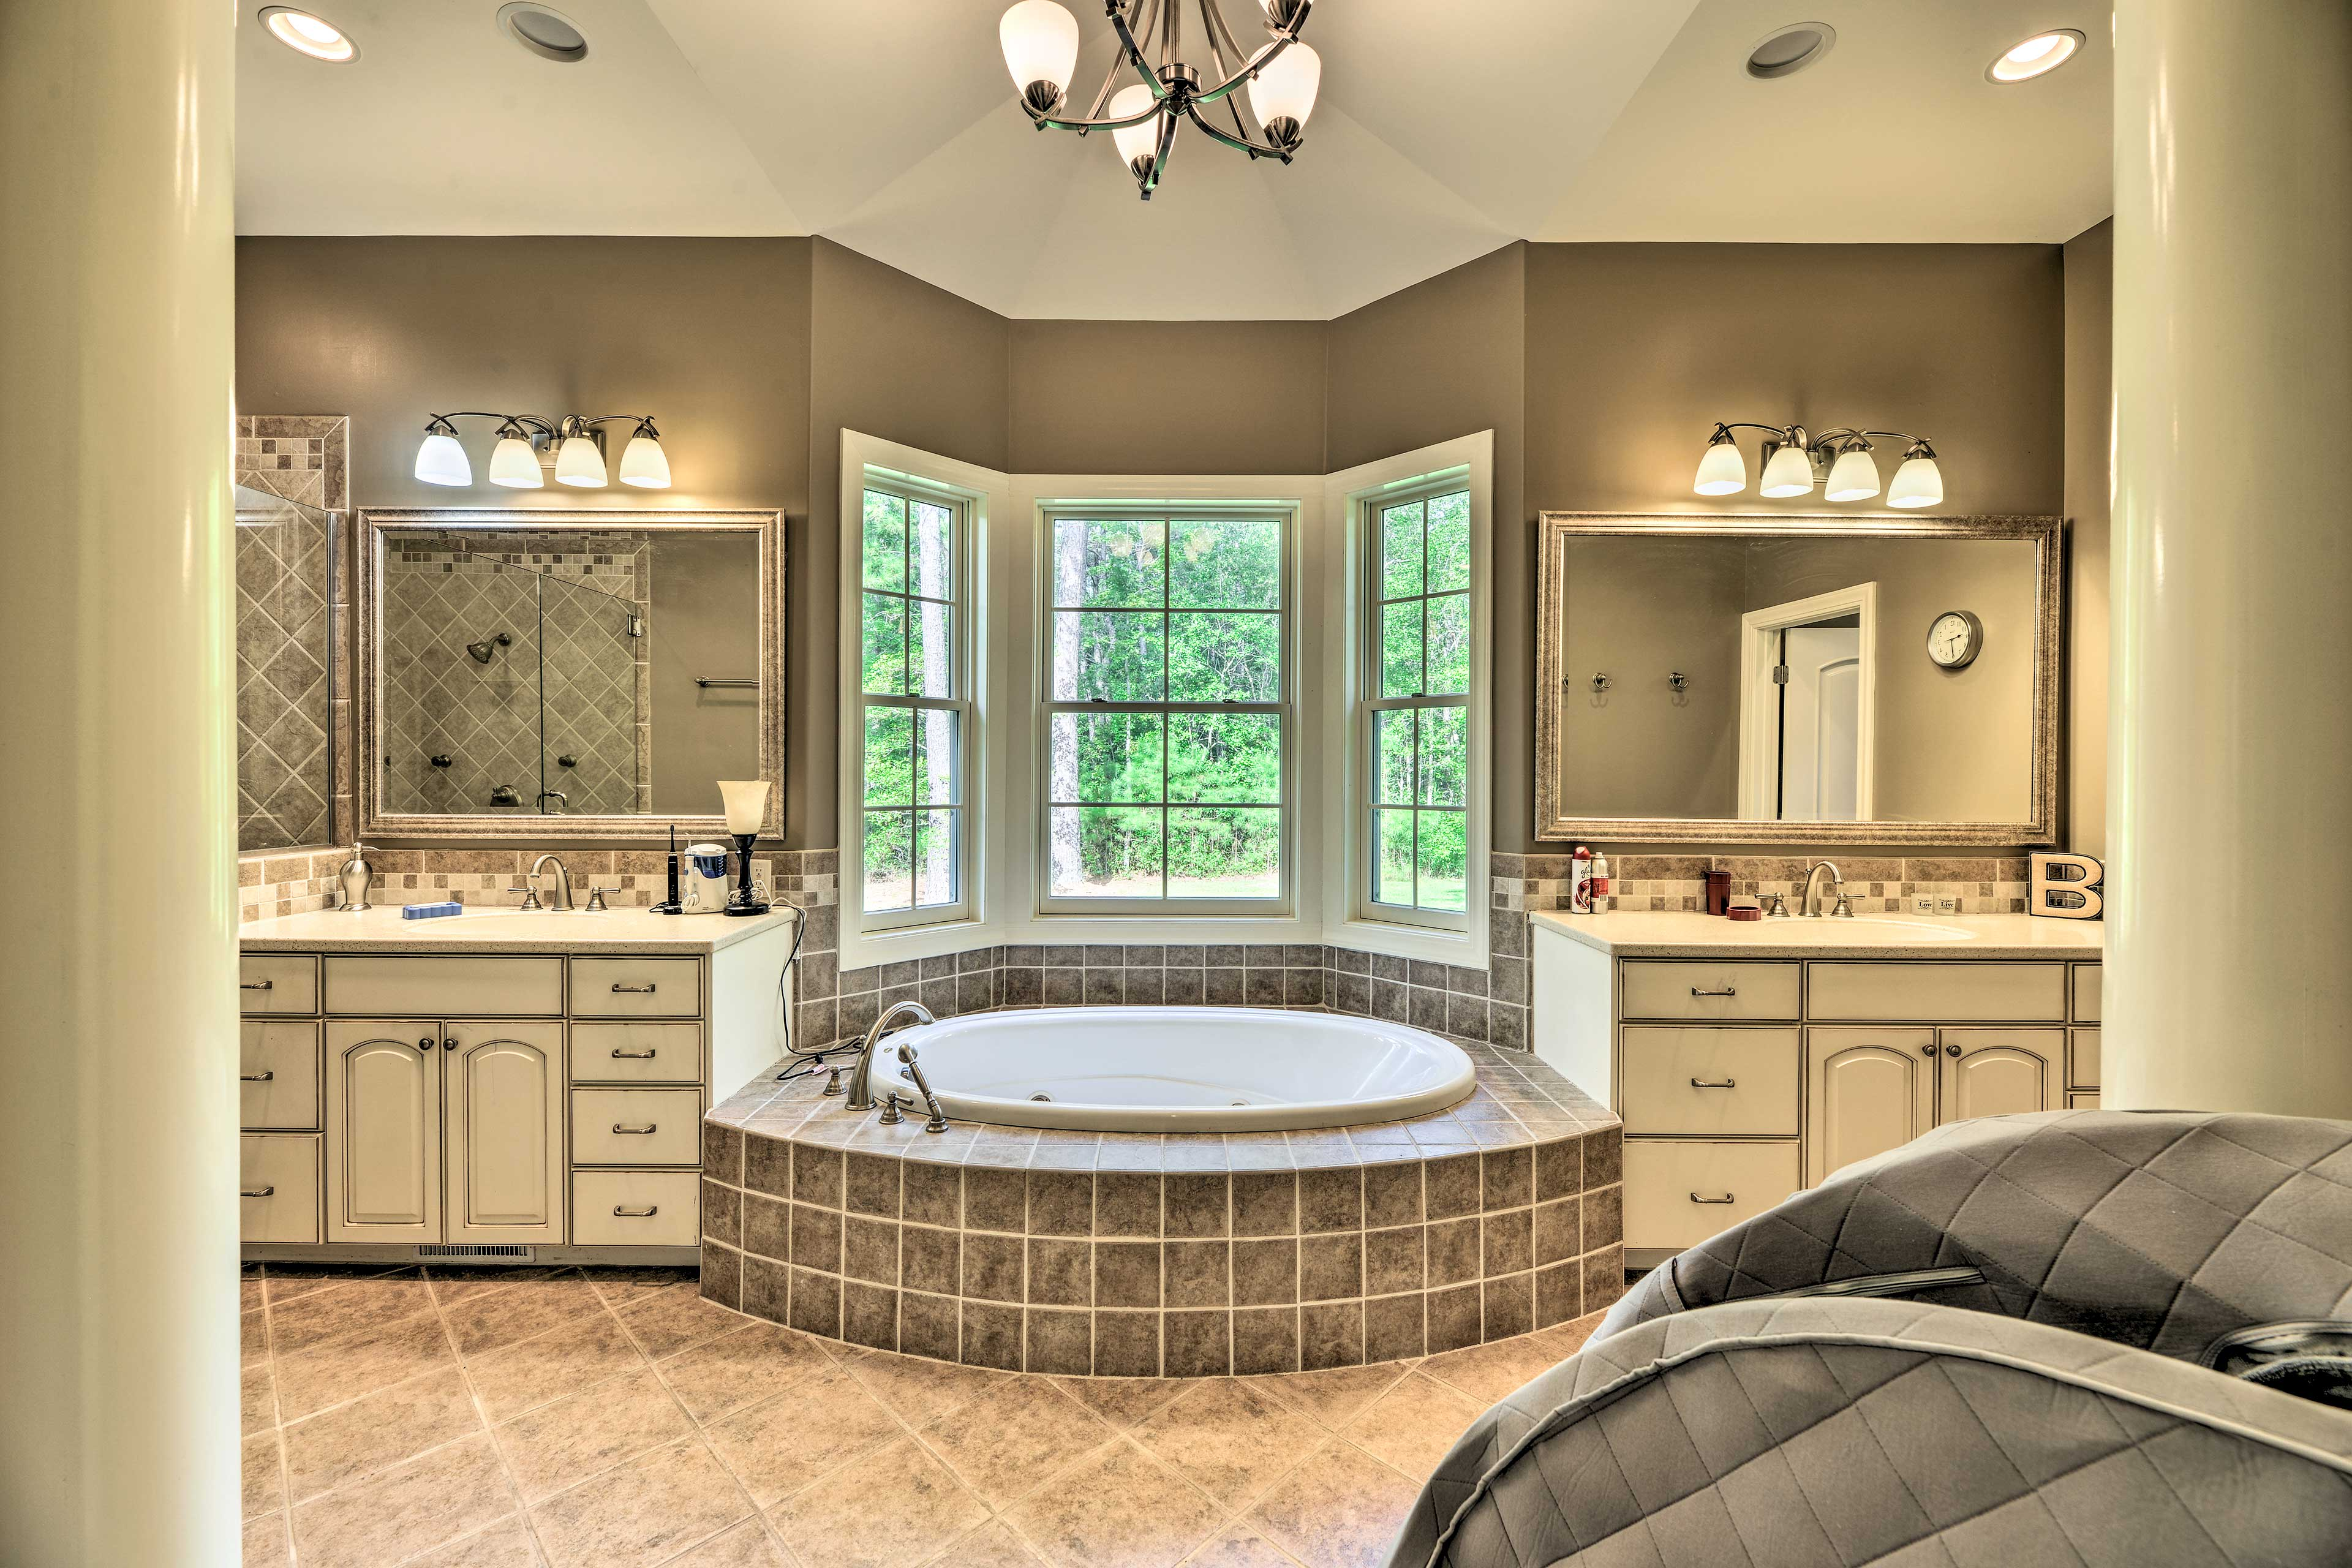 Soak your worries away in the jetted soaking tub in the en-suite bathroom.